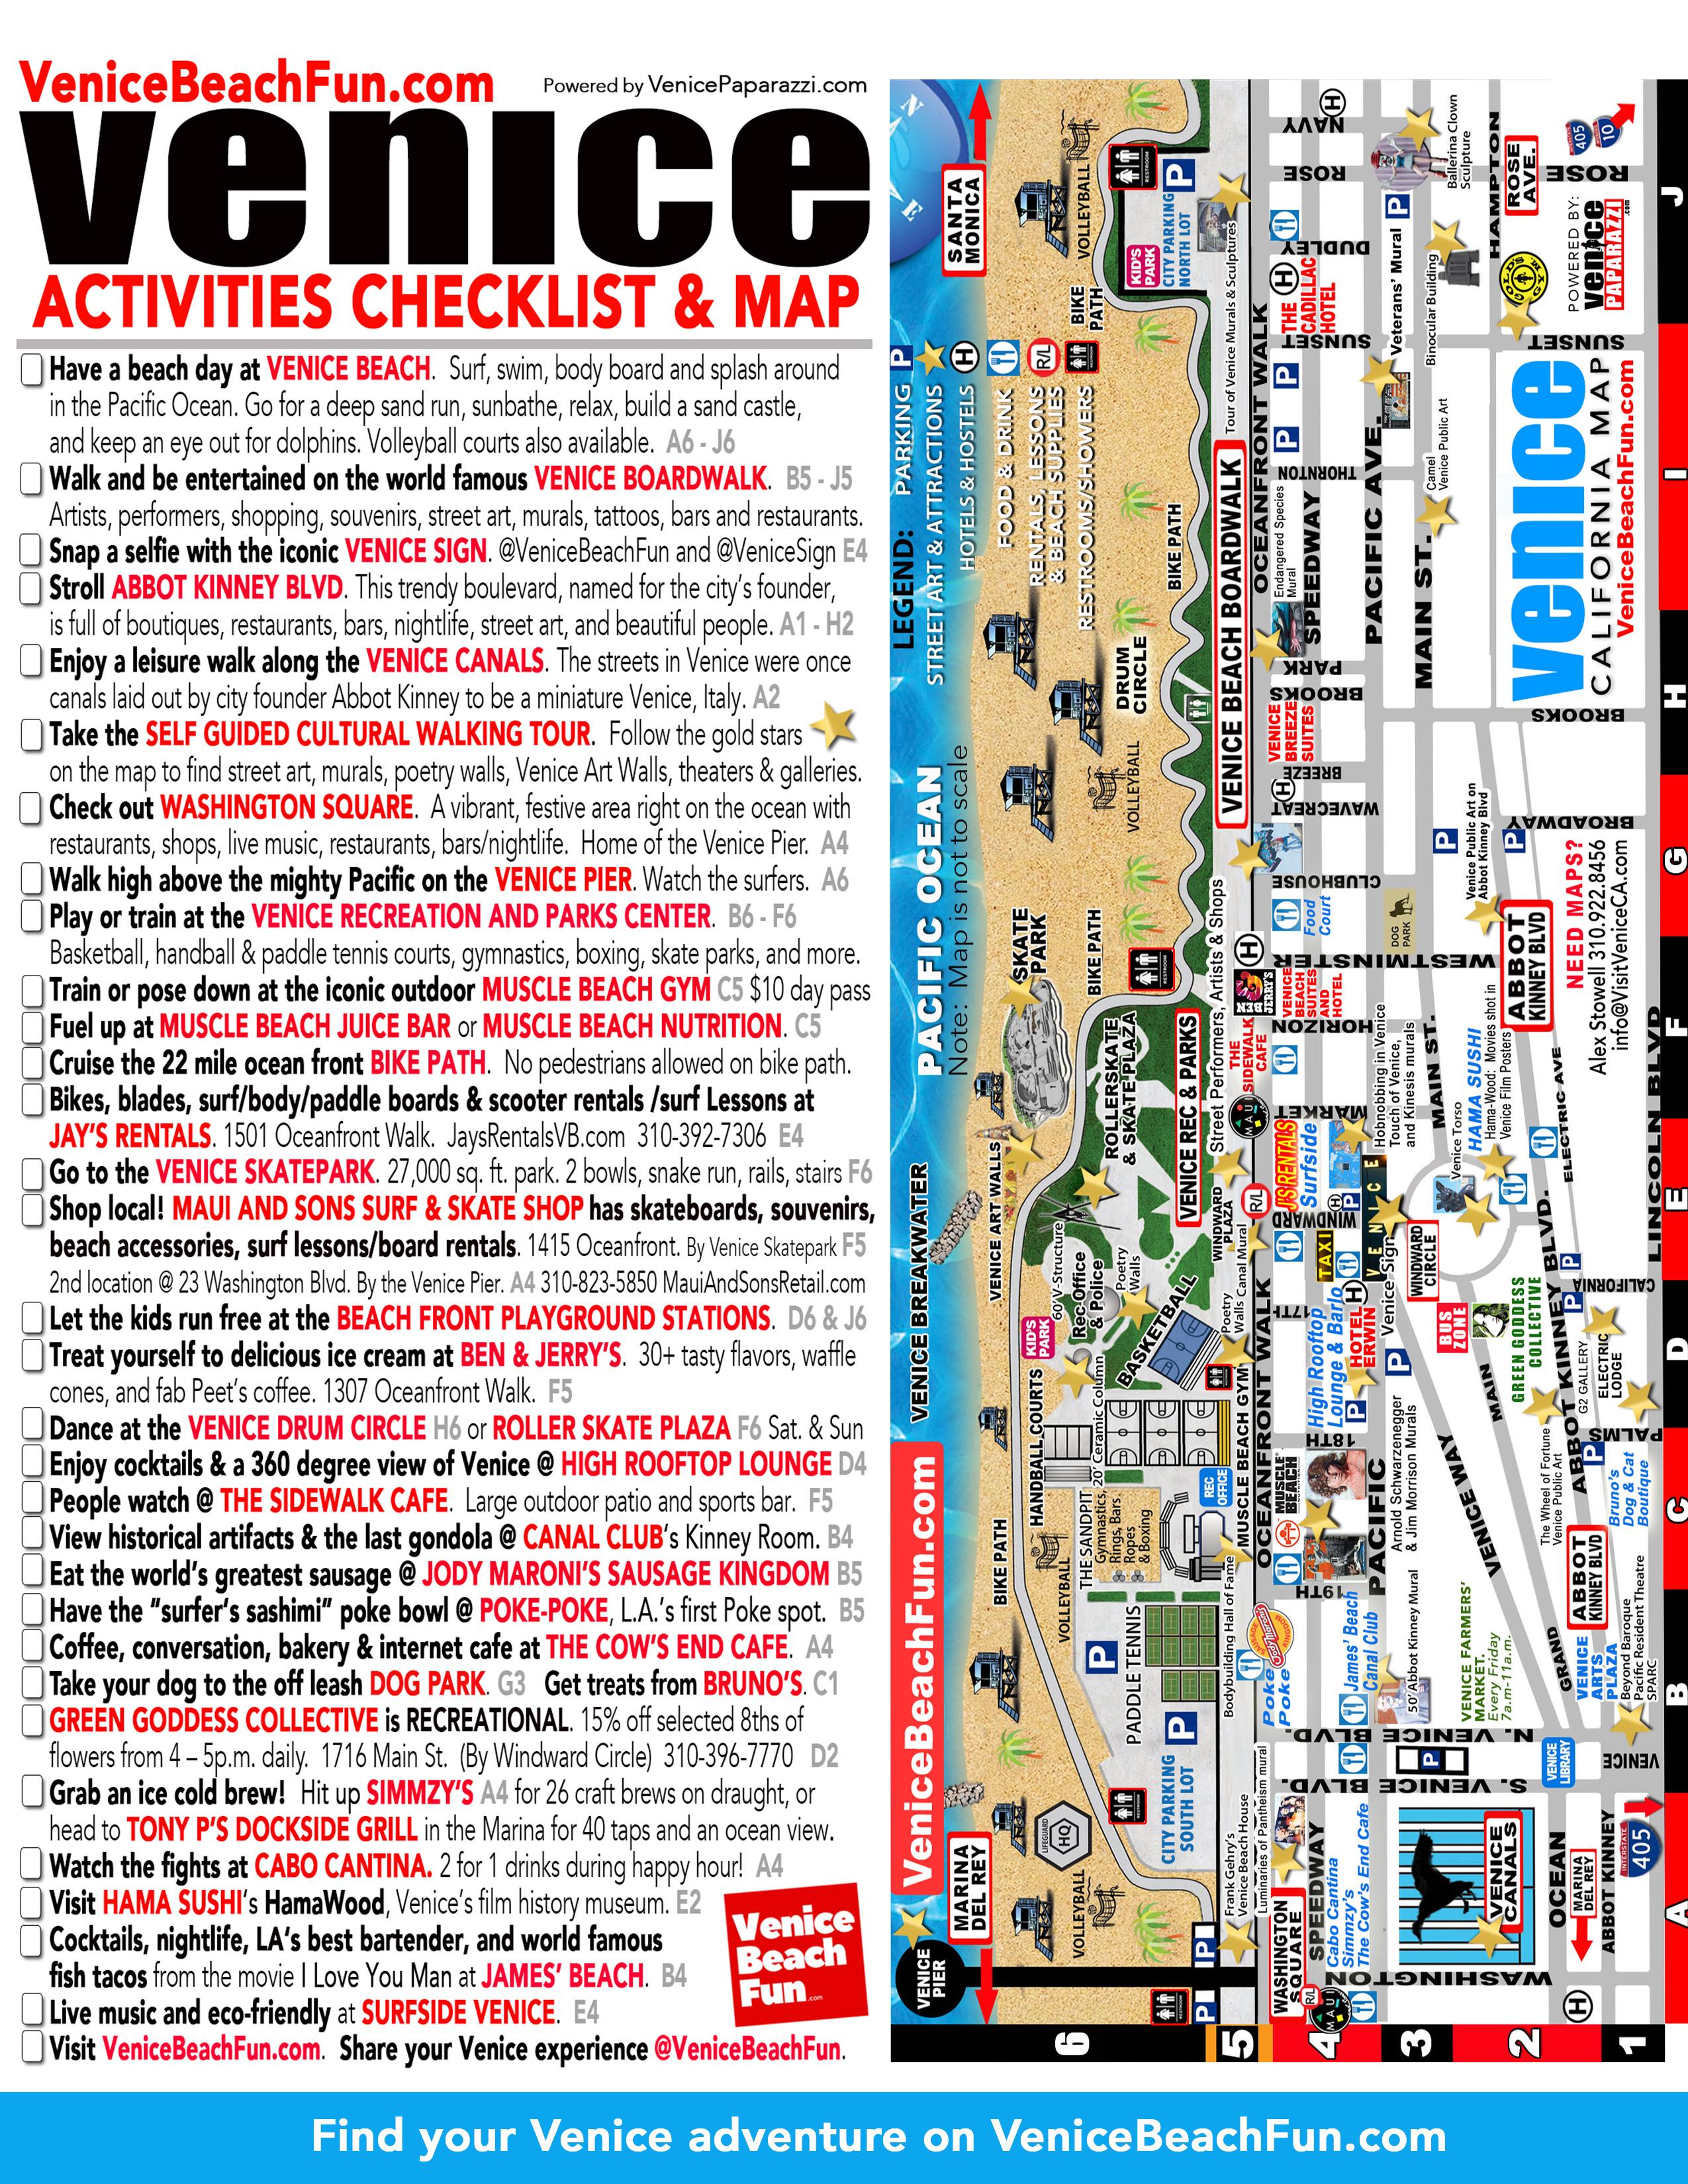 Venice Activities Checklist & Map - Venice Beach California Map